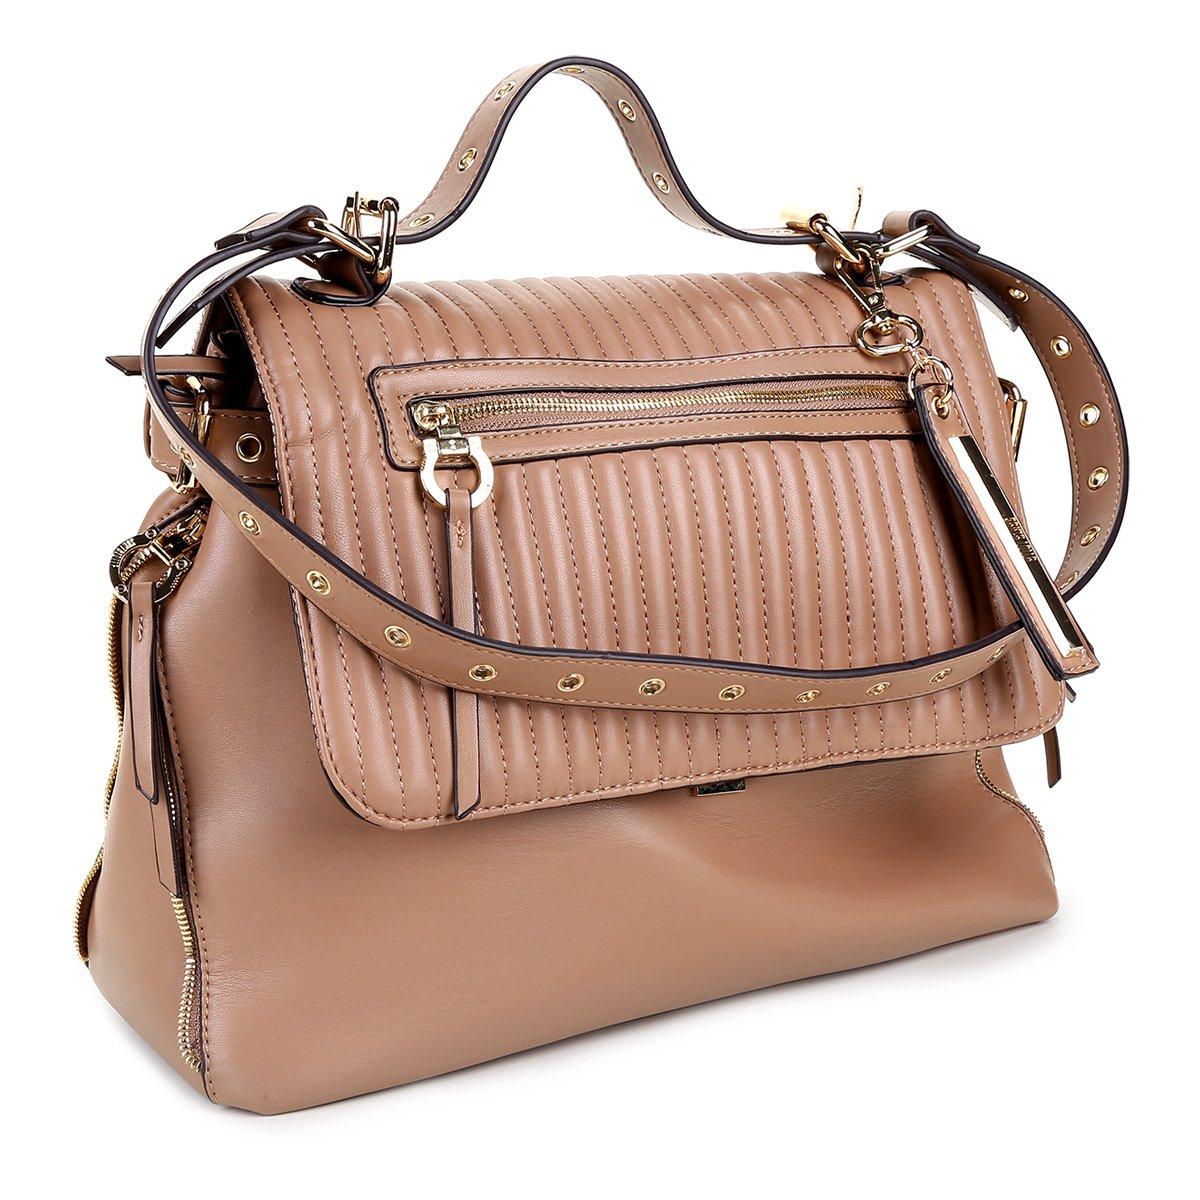 e46febdbff926 Bolsa Santa Lolla Flap Bolso Frontal Feminina - Compre Agora   Zattini